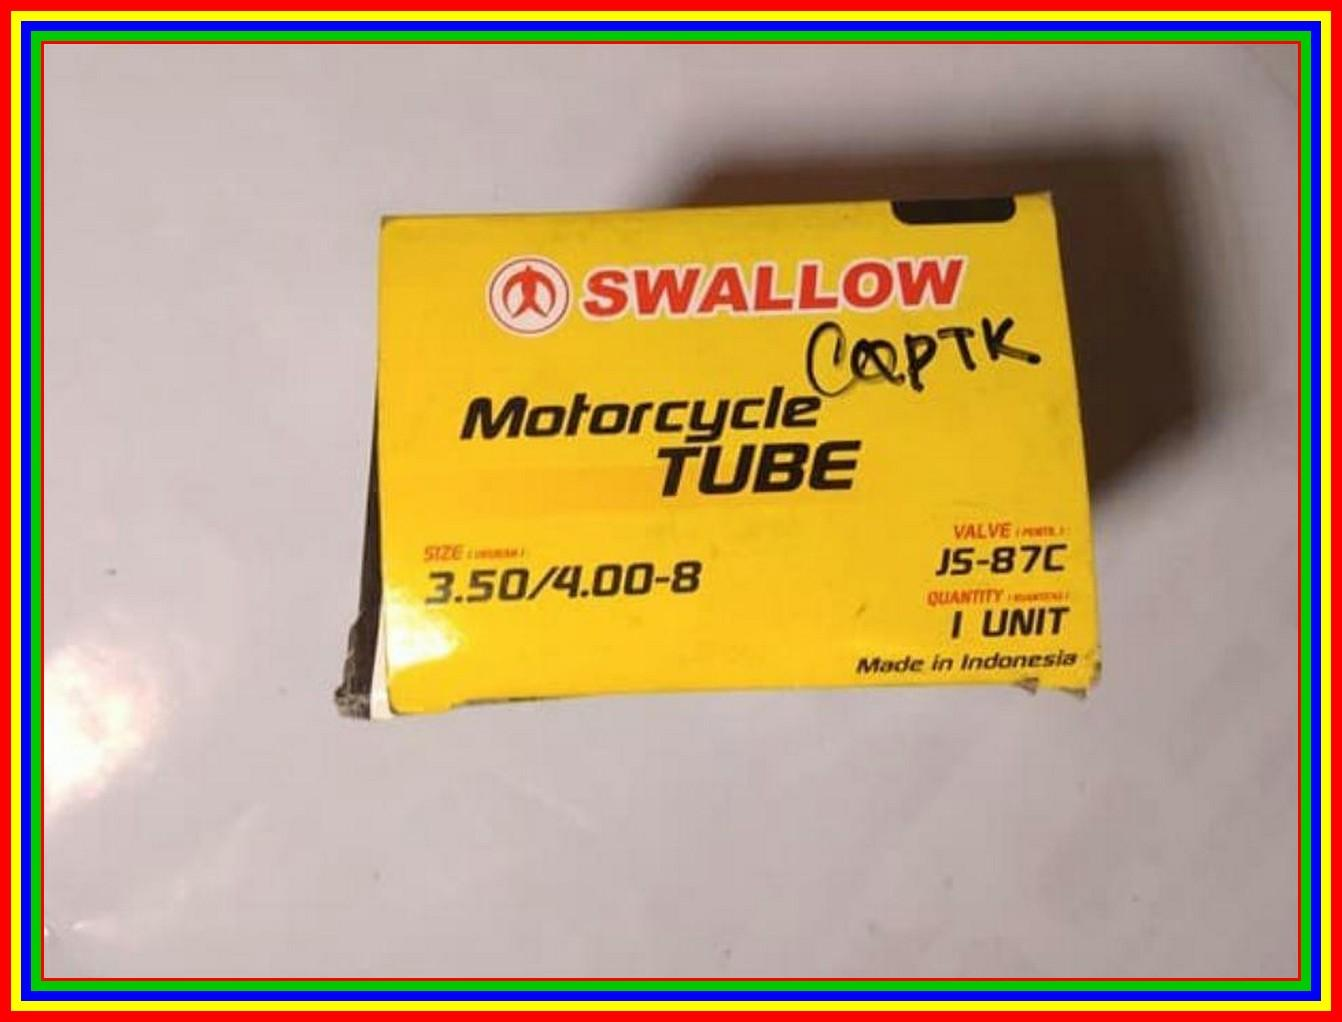 Ban Dalam Swallow Depan Vespa 3.50/4.00 - 8 By Pusat Remote.